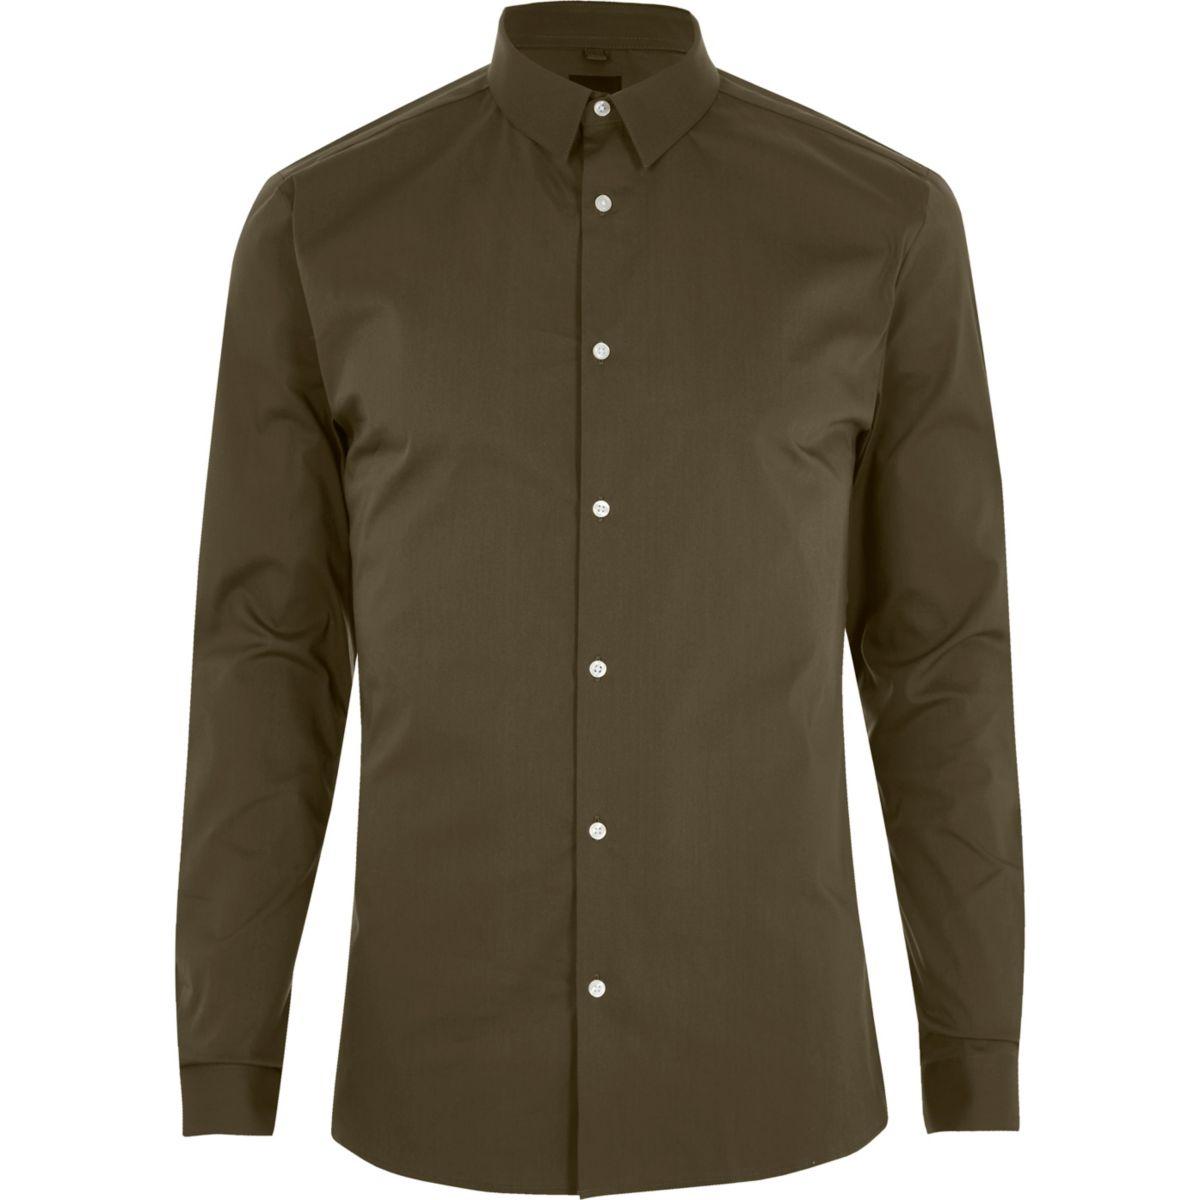 Khaki green long sleeve muscle fit shirt